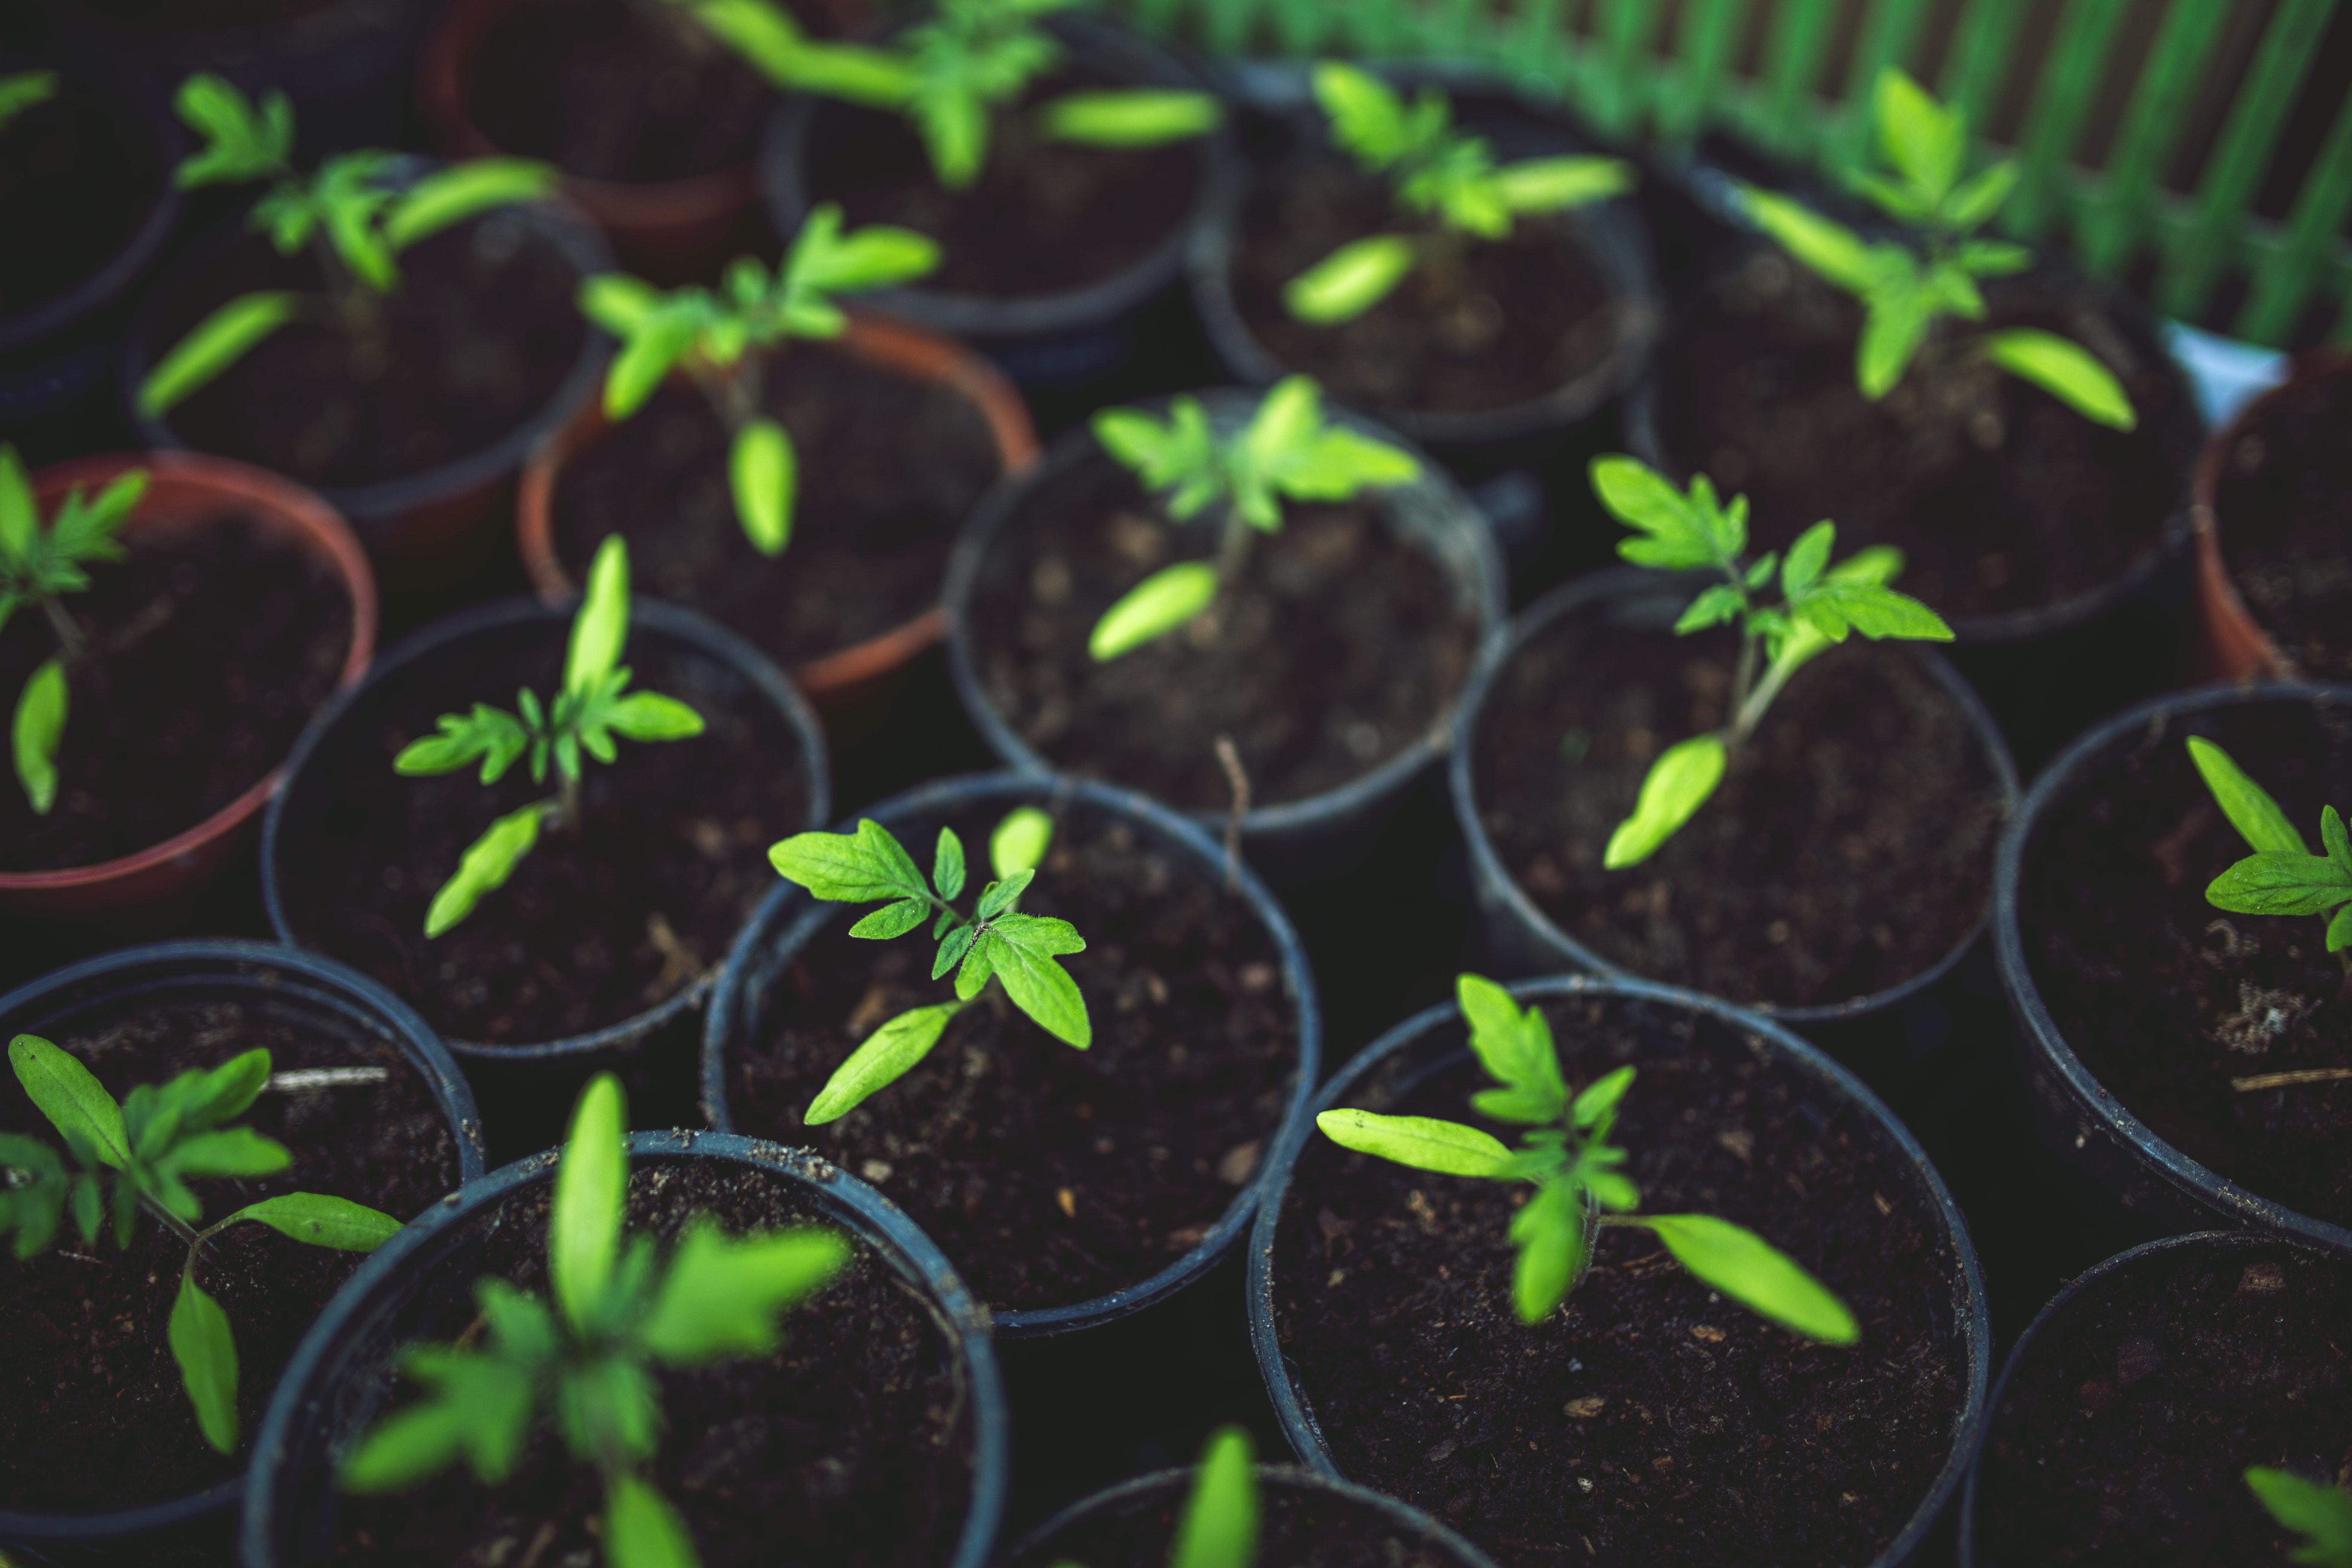 Young tomato, Maturation, Pot, Little, Leaf, HQ Photo